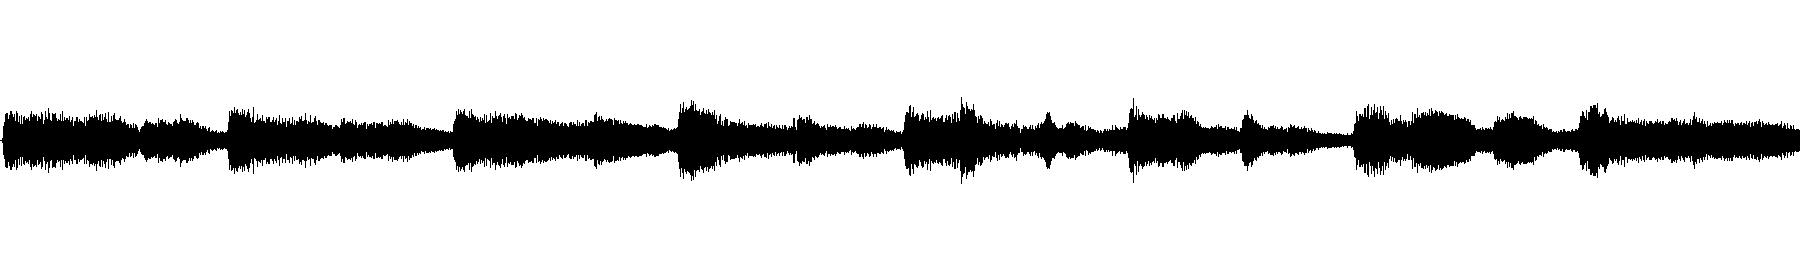 vinyl piano melody loop bpm 100